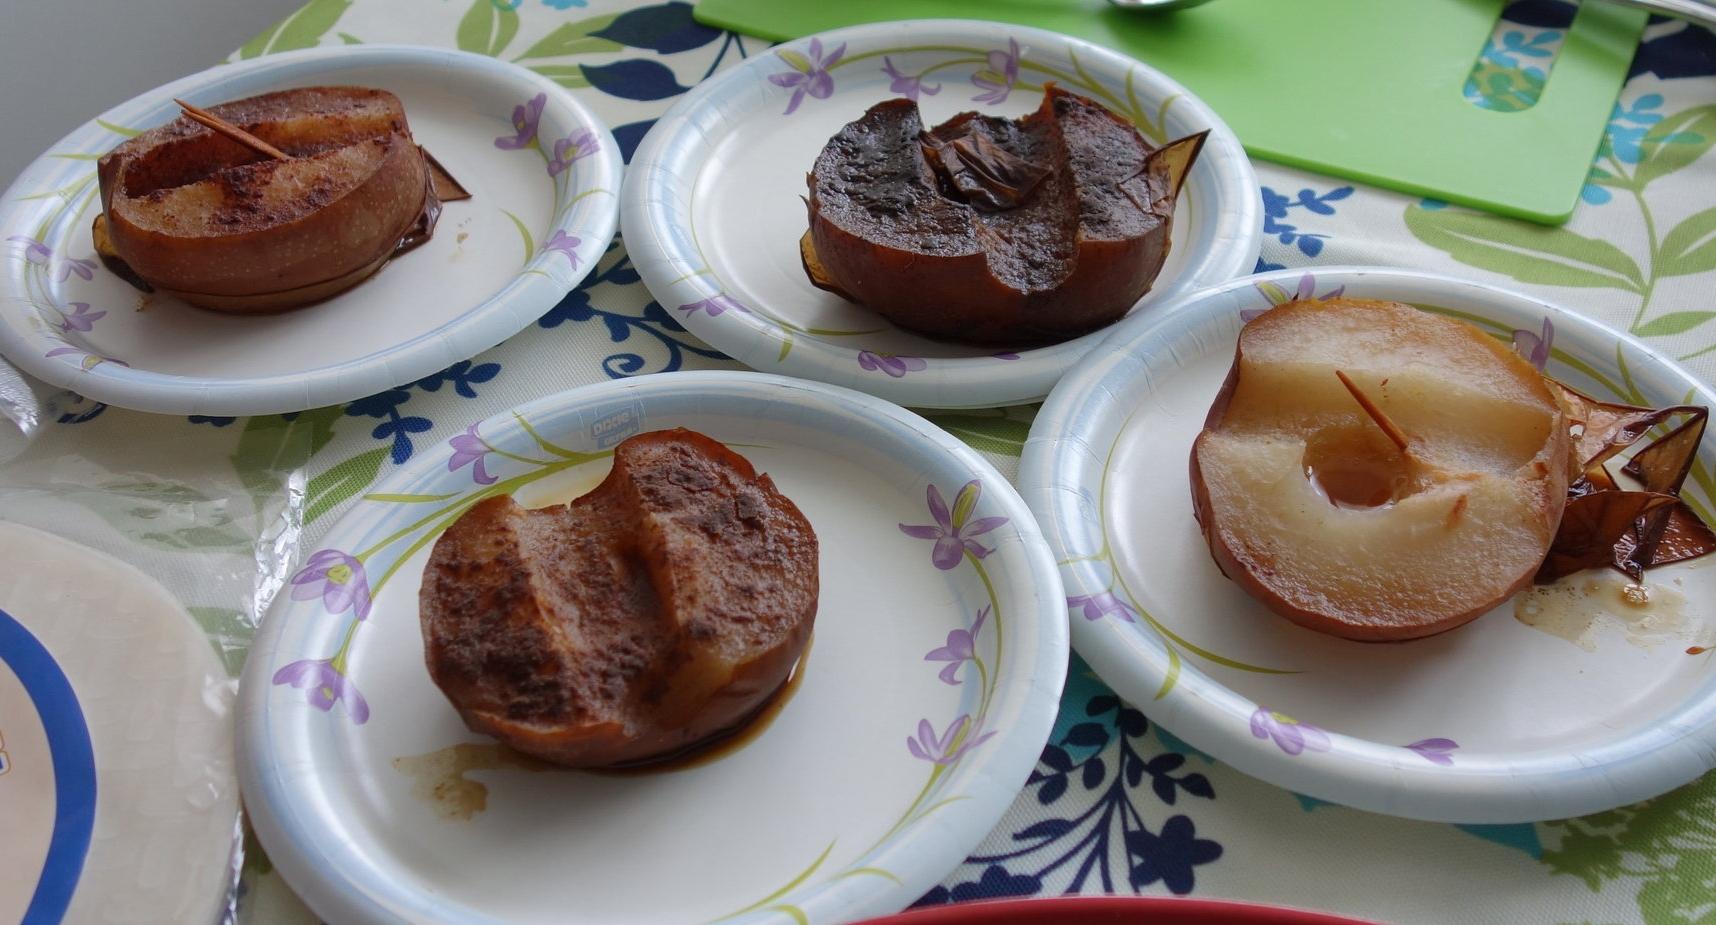 top left: cinnamon asian pear, top right: blackstrap molasses asian pear, bottom left: five spice asian pear, bottom right: honey asian pear